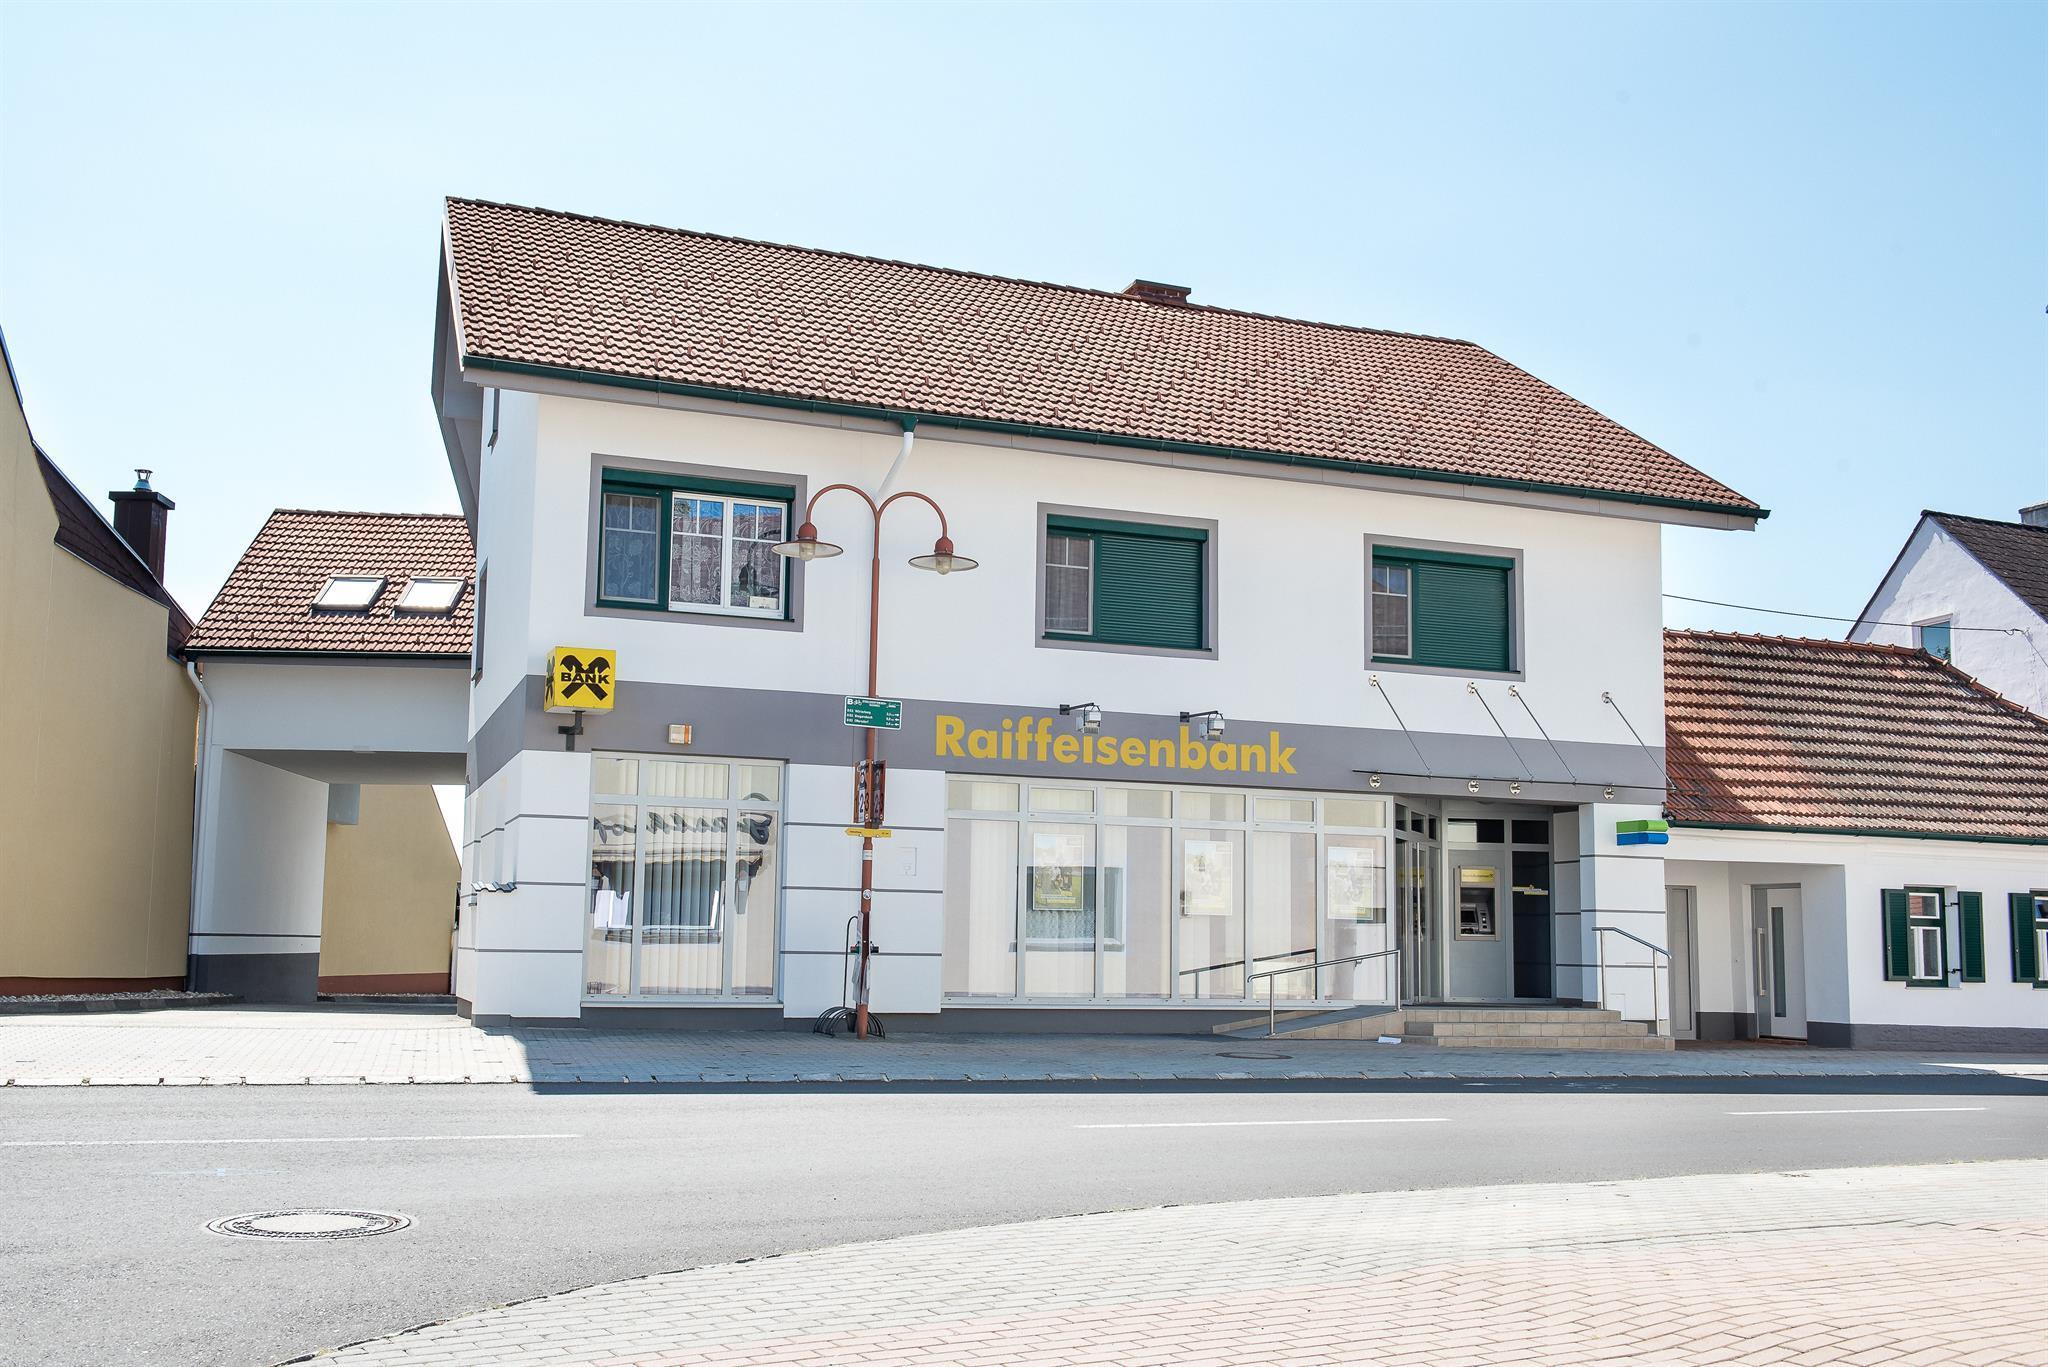 Raiffeisenbank Stinatz